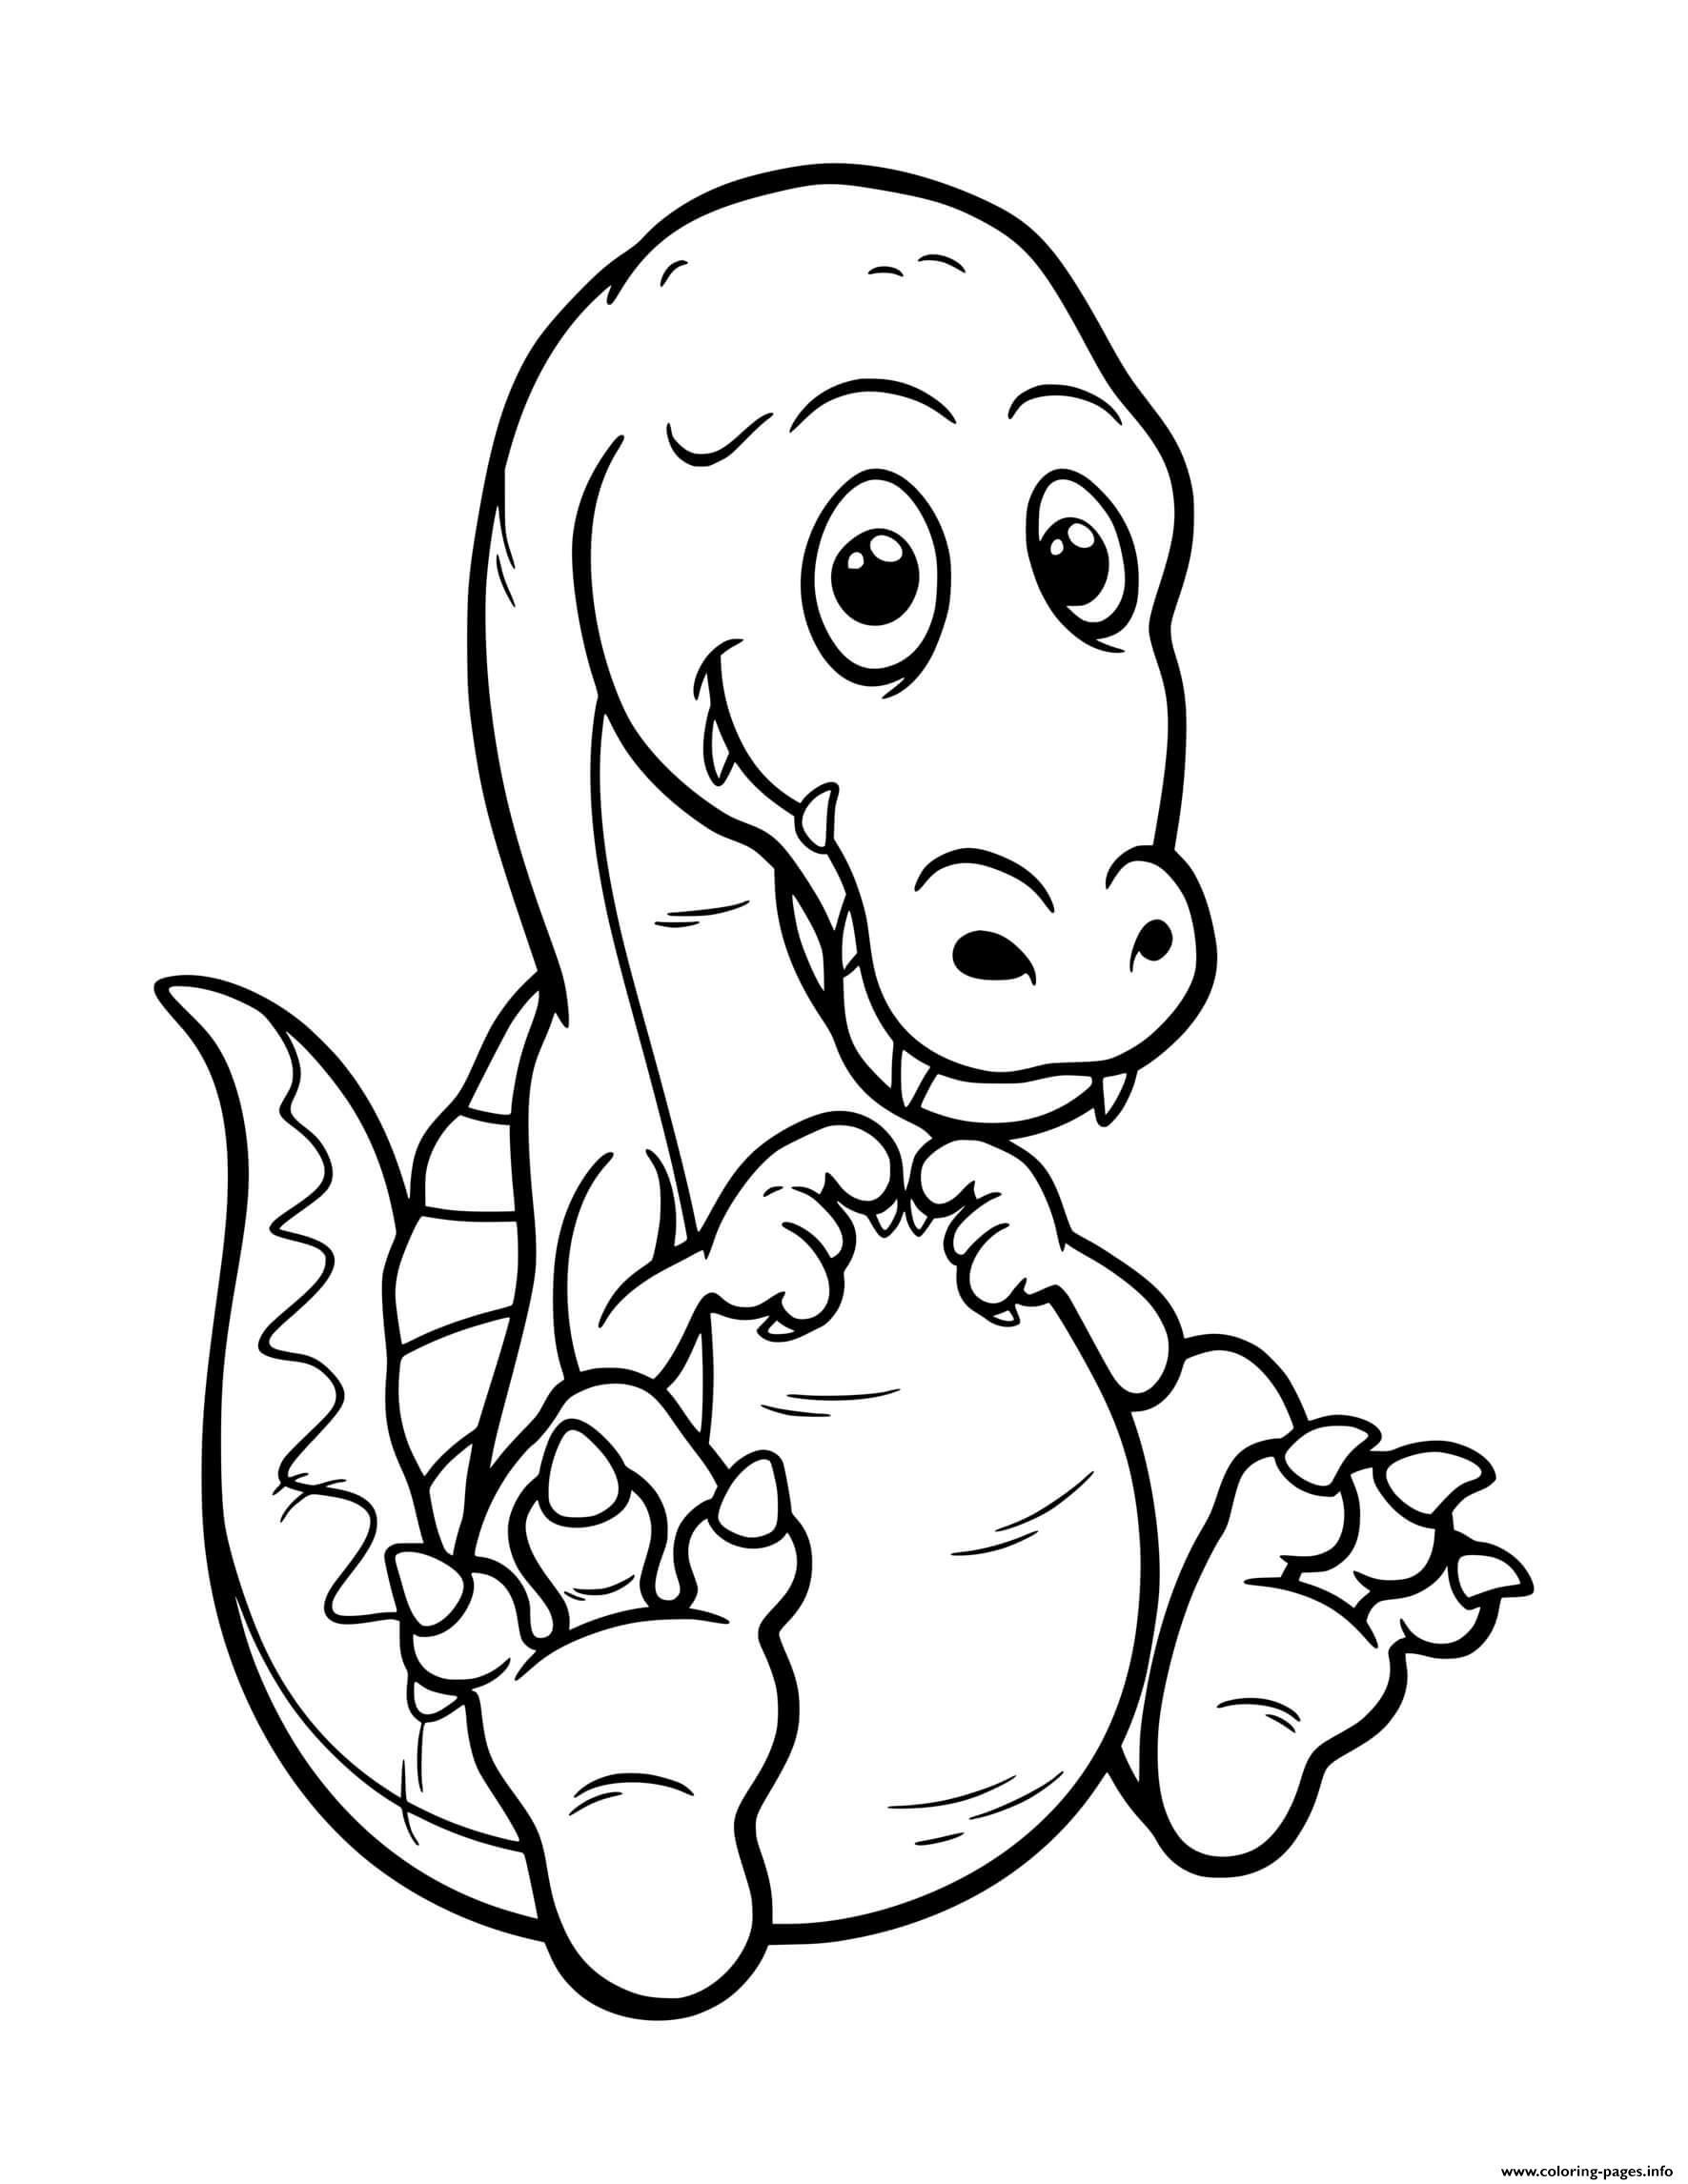 Dinosaur Cute Baby Spinosaurus Coloring Pages Printable